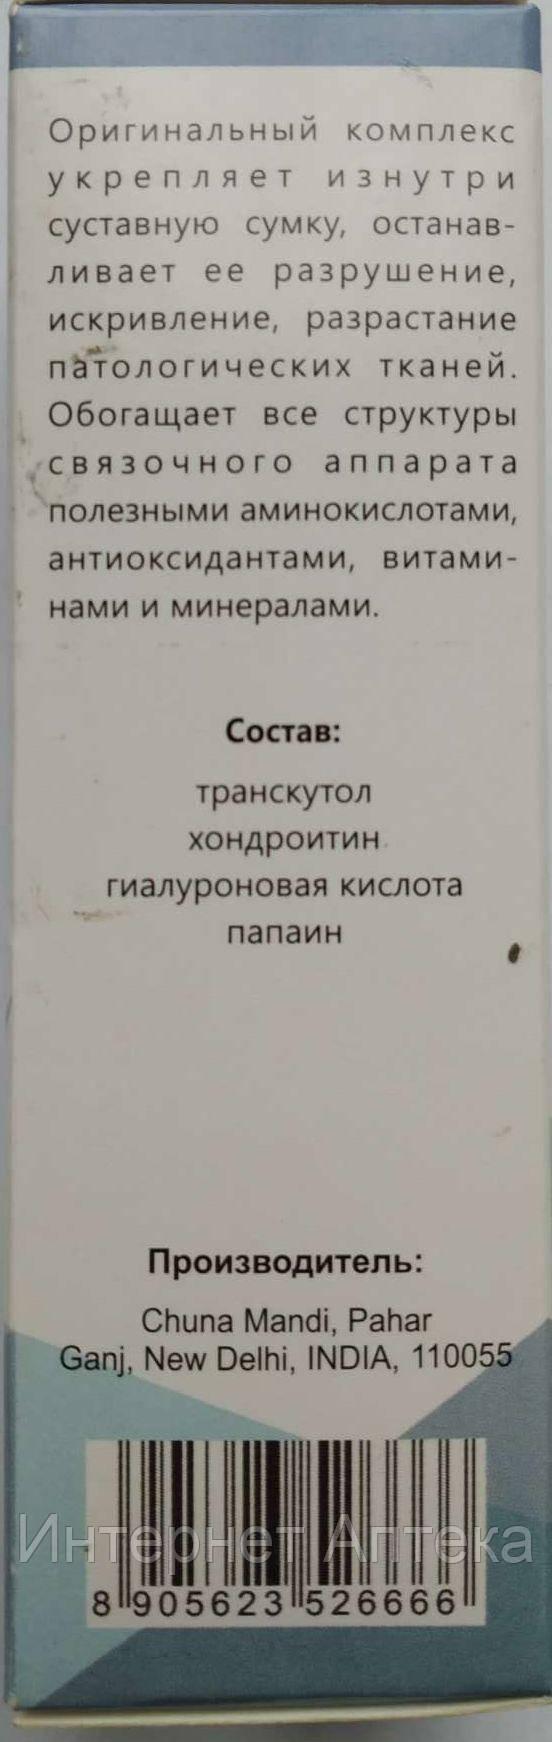 Артролайф